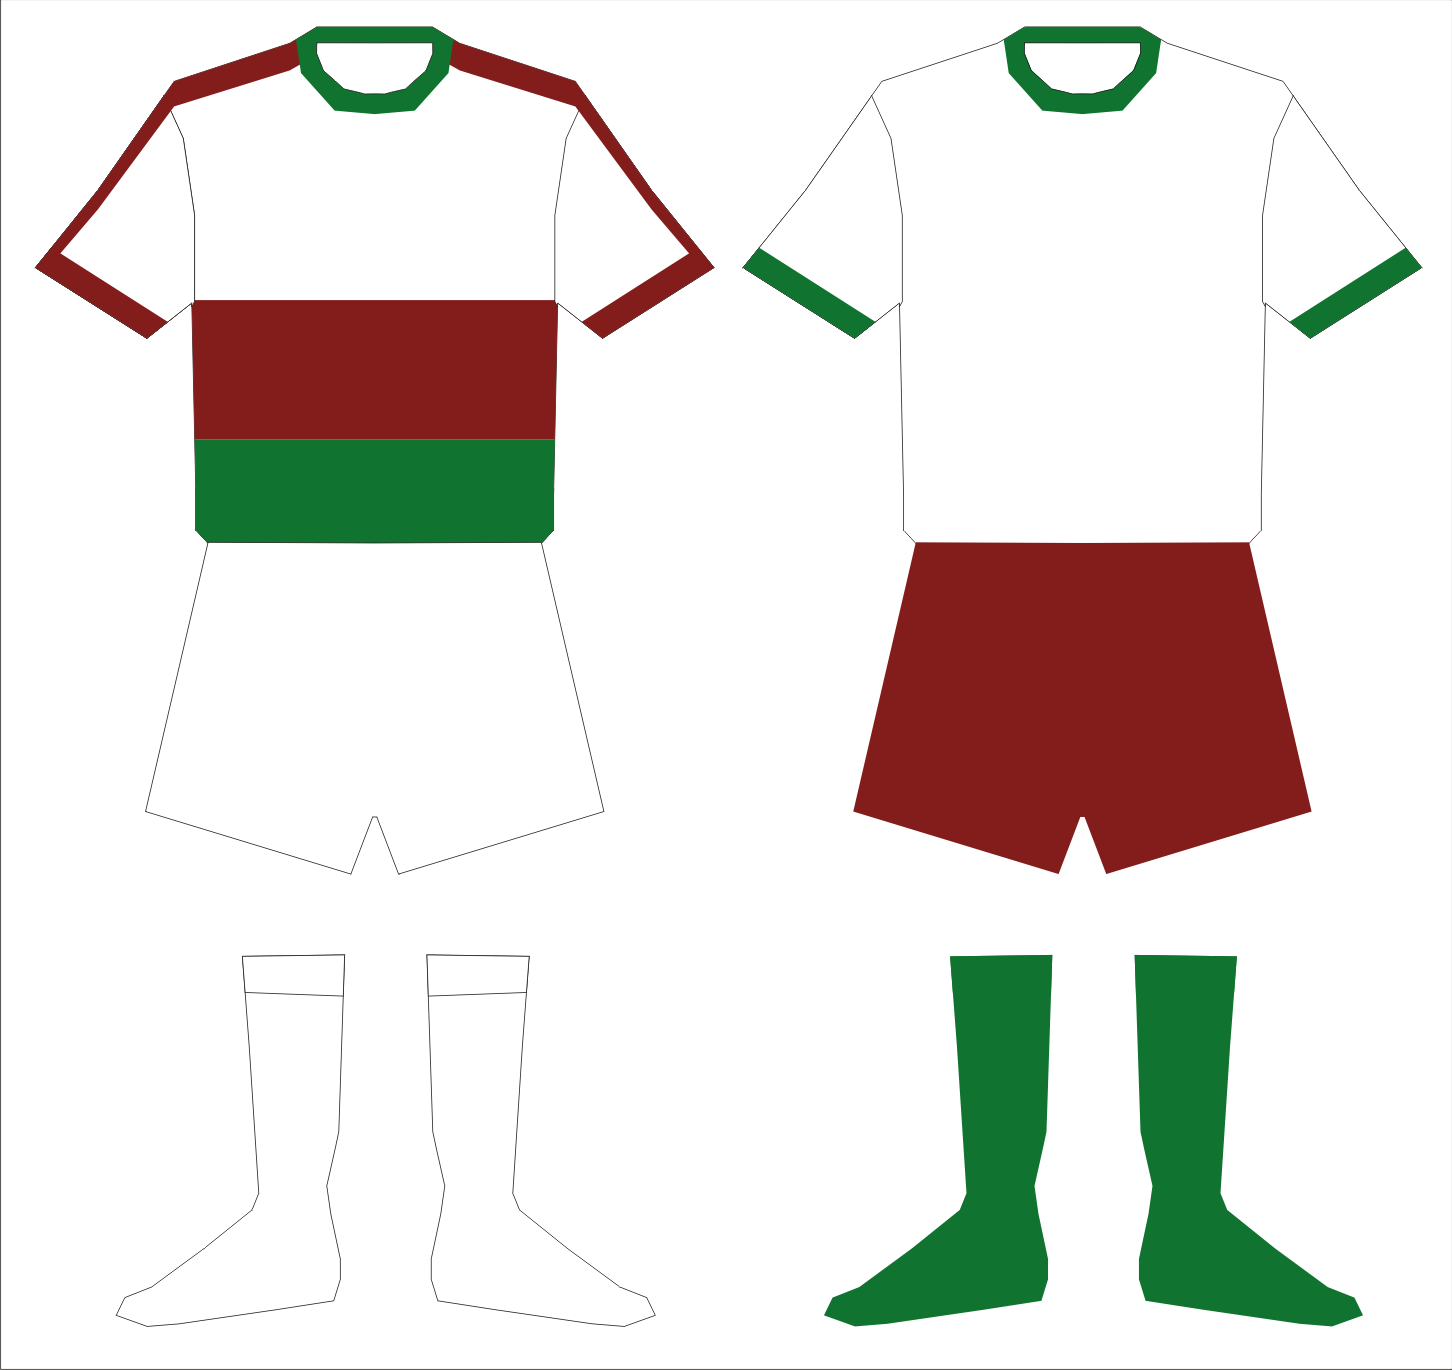 File:Blumenau uniforme.png.